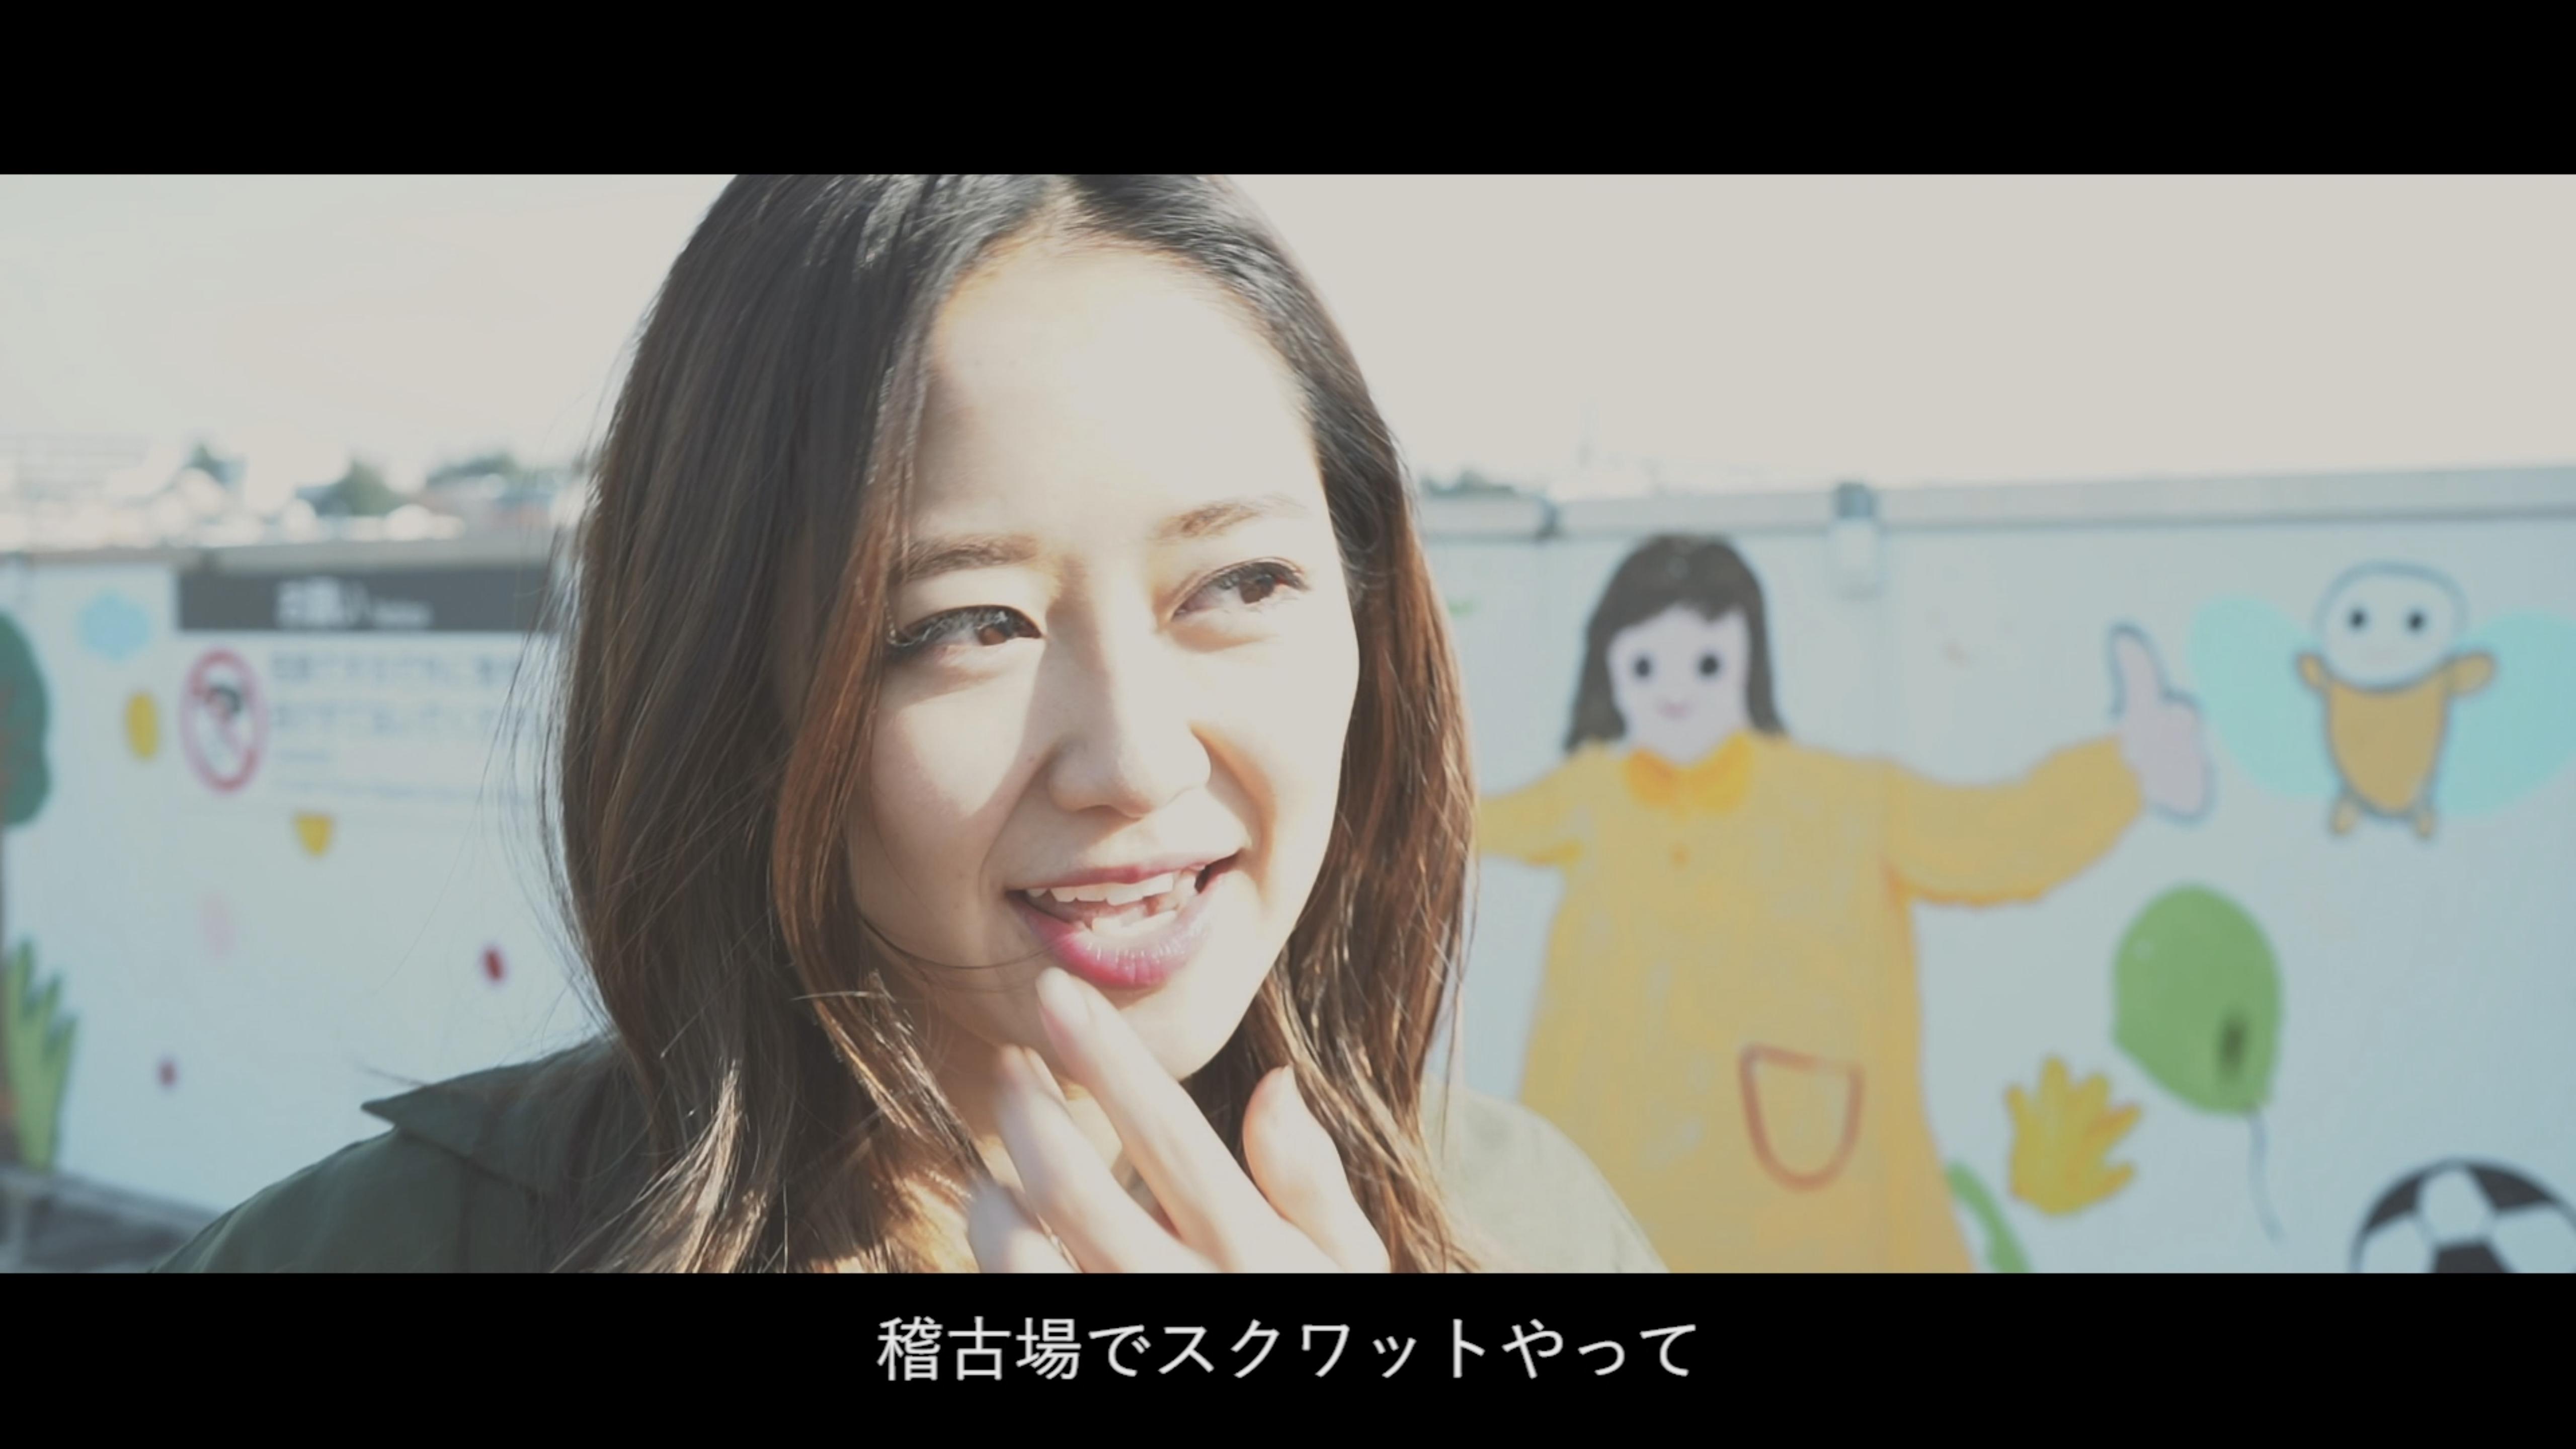 hy4_4yh(ハイパーヨーヨ)ドキュメンタリー第3話 画像05